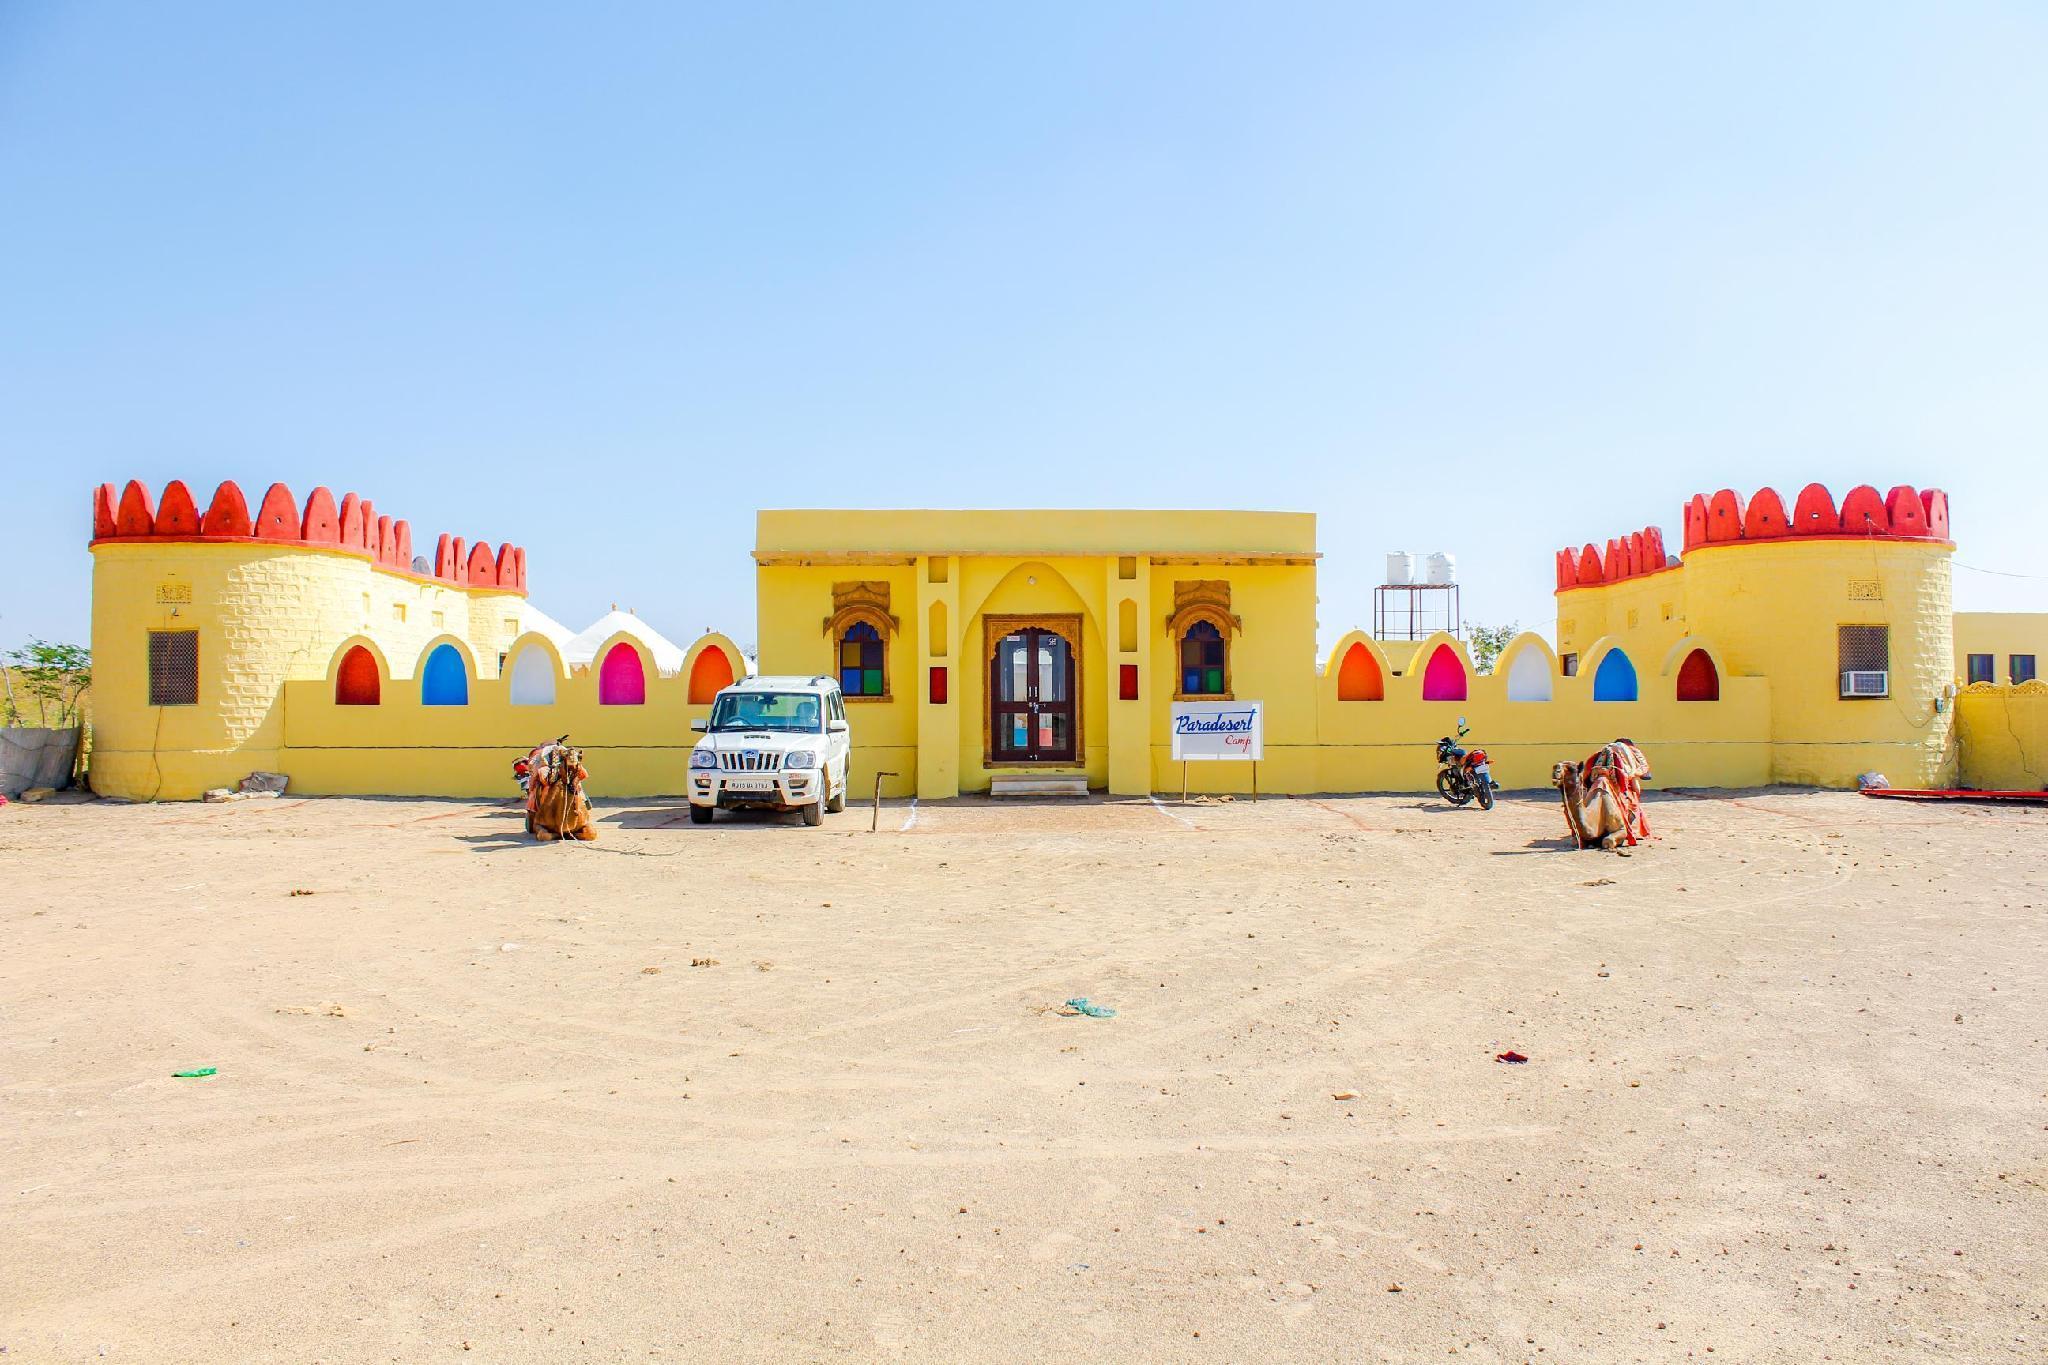 V Resorts Paradesert Camps